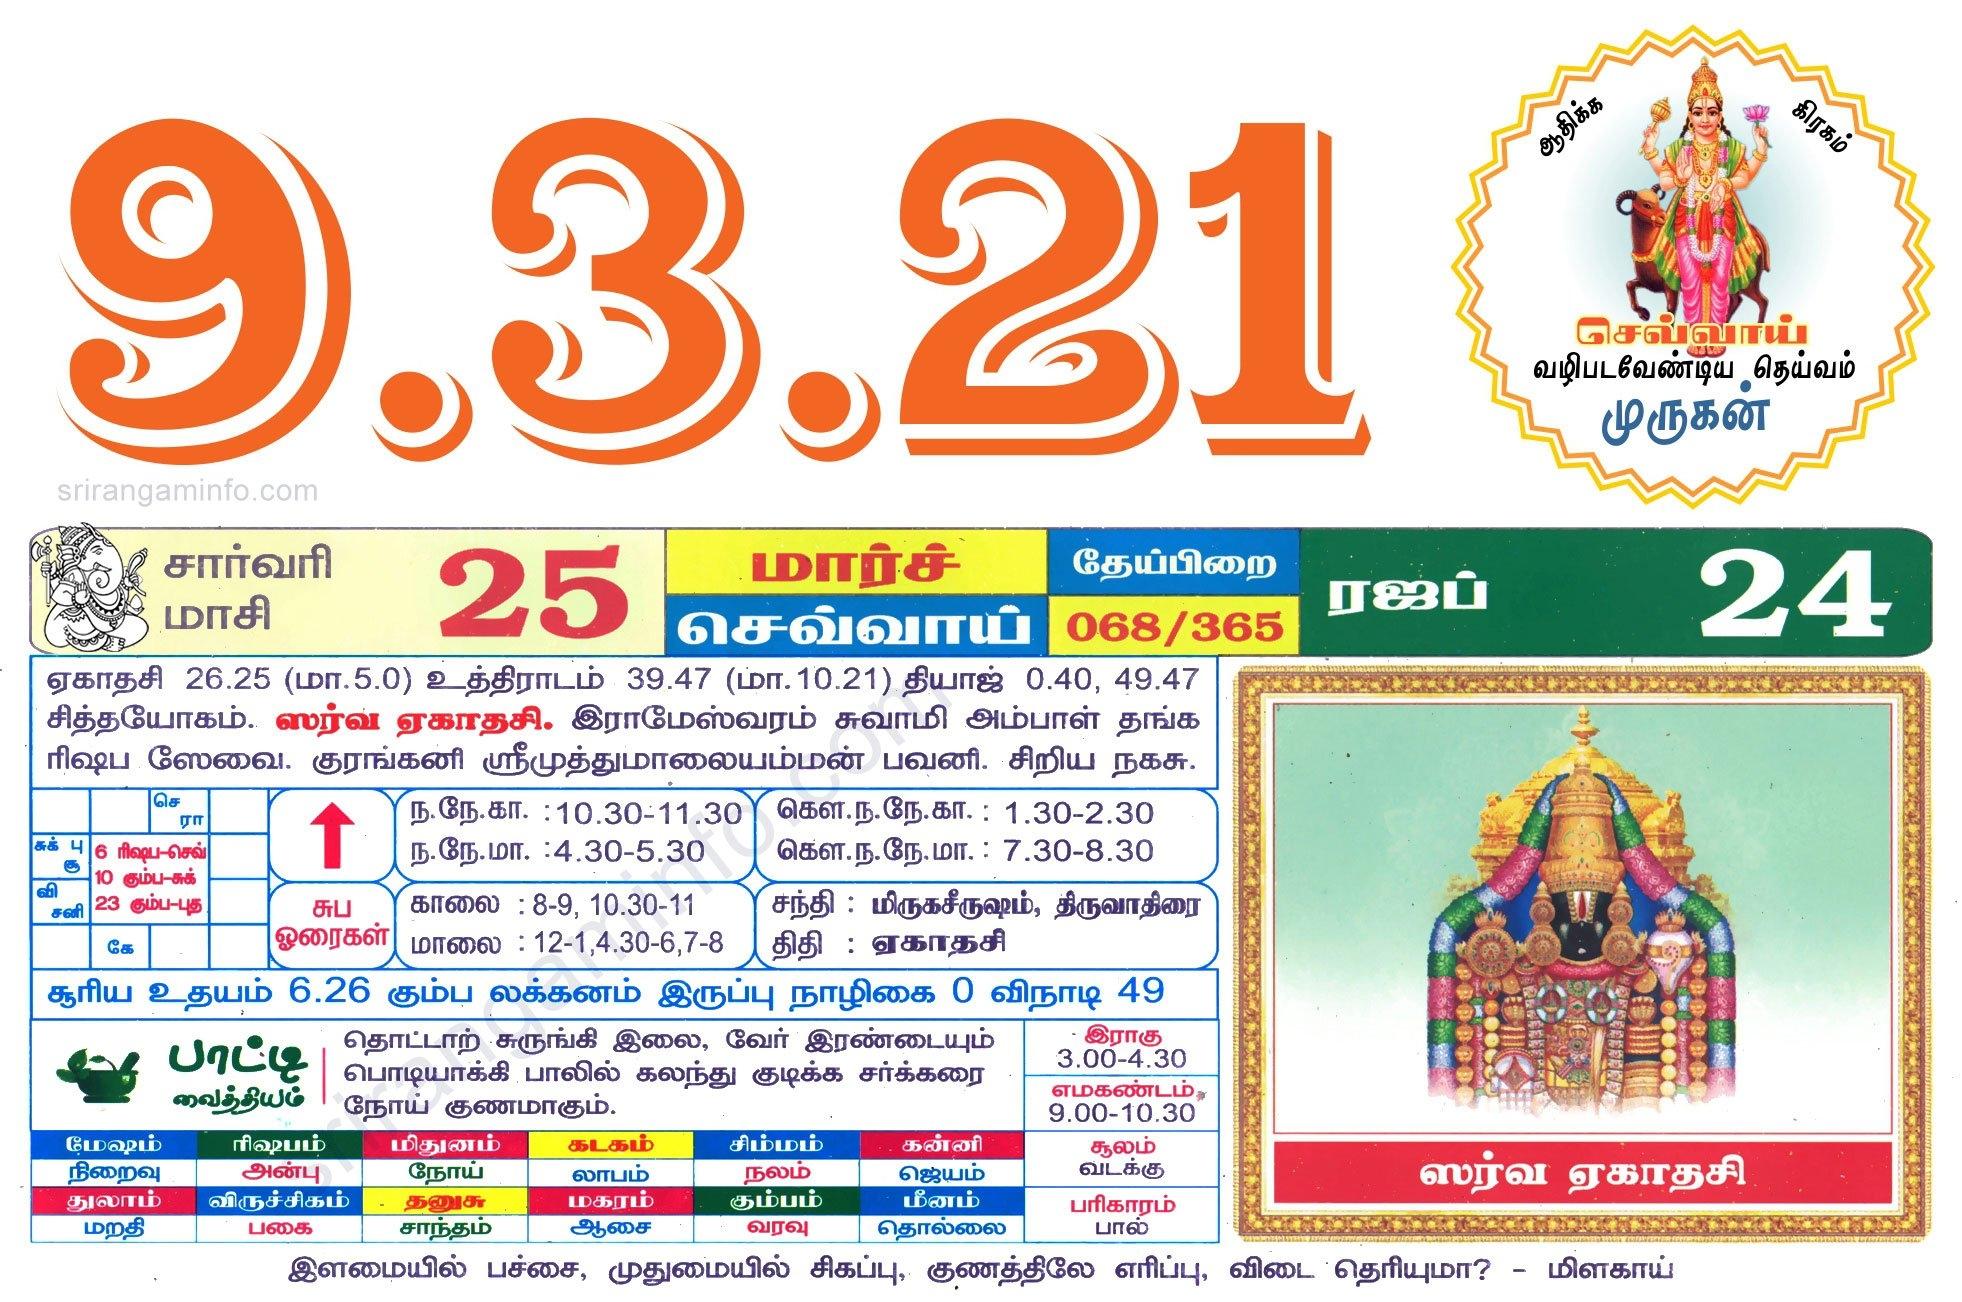 Tamil Daily Calendar 2021, Tamil Calendar 2021, Nalla Neram - தமிழ் தினசரி காலண்டர் throughout Calender Kuda In Tamil 2021 Photo